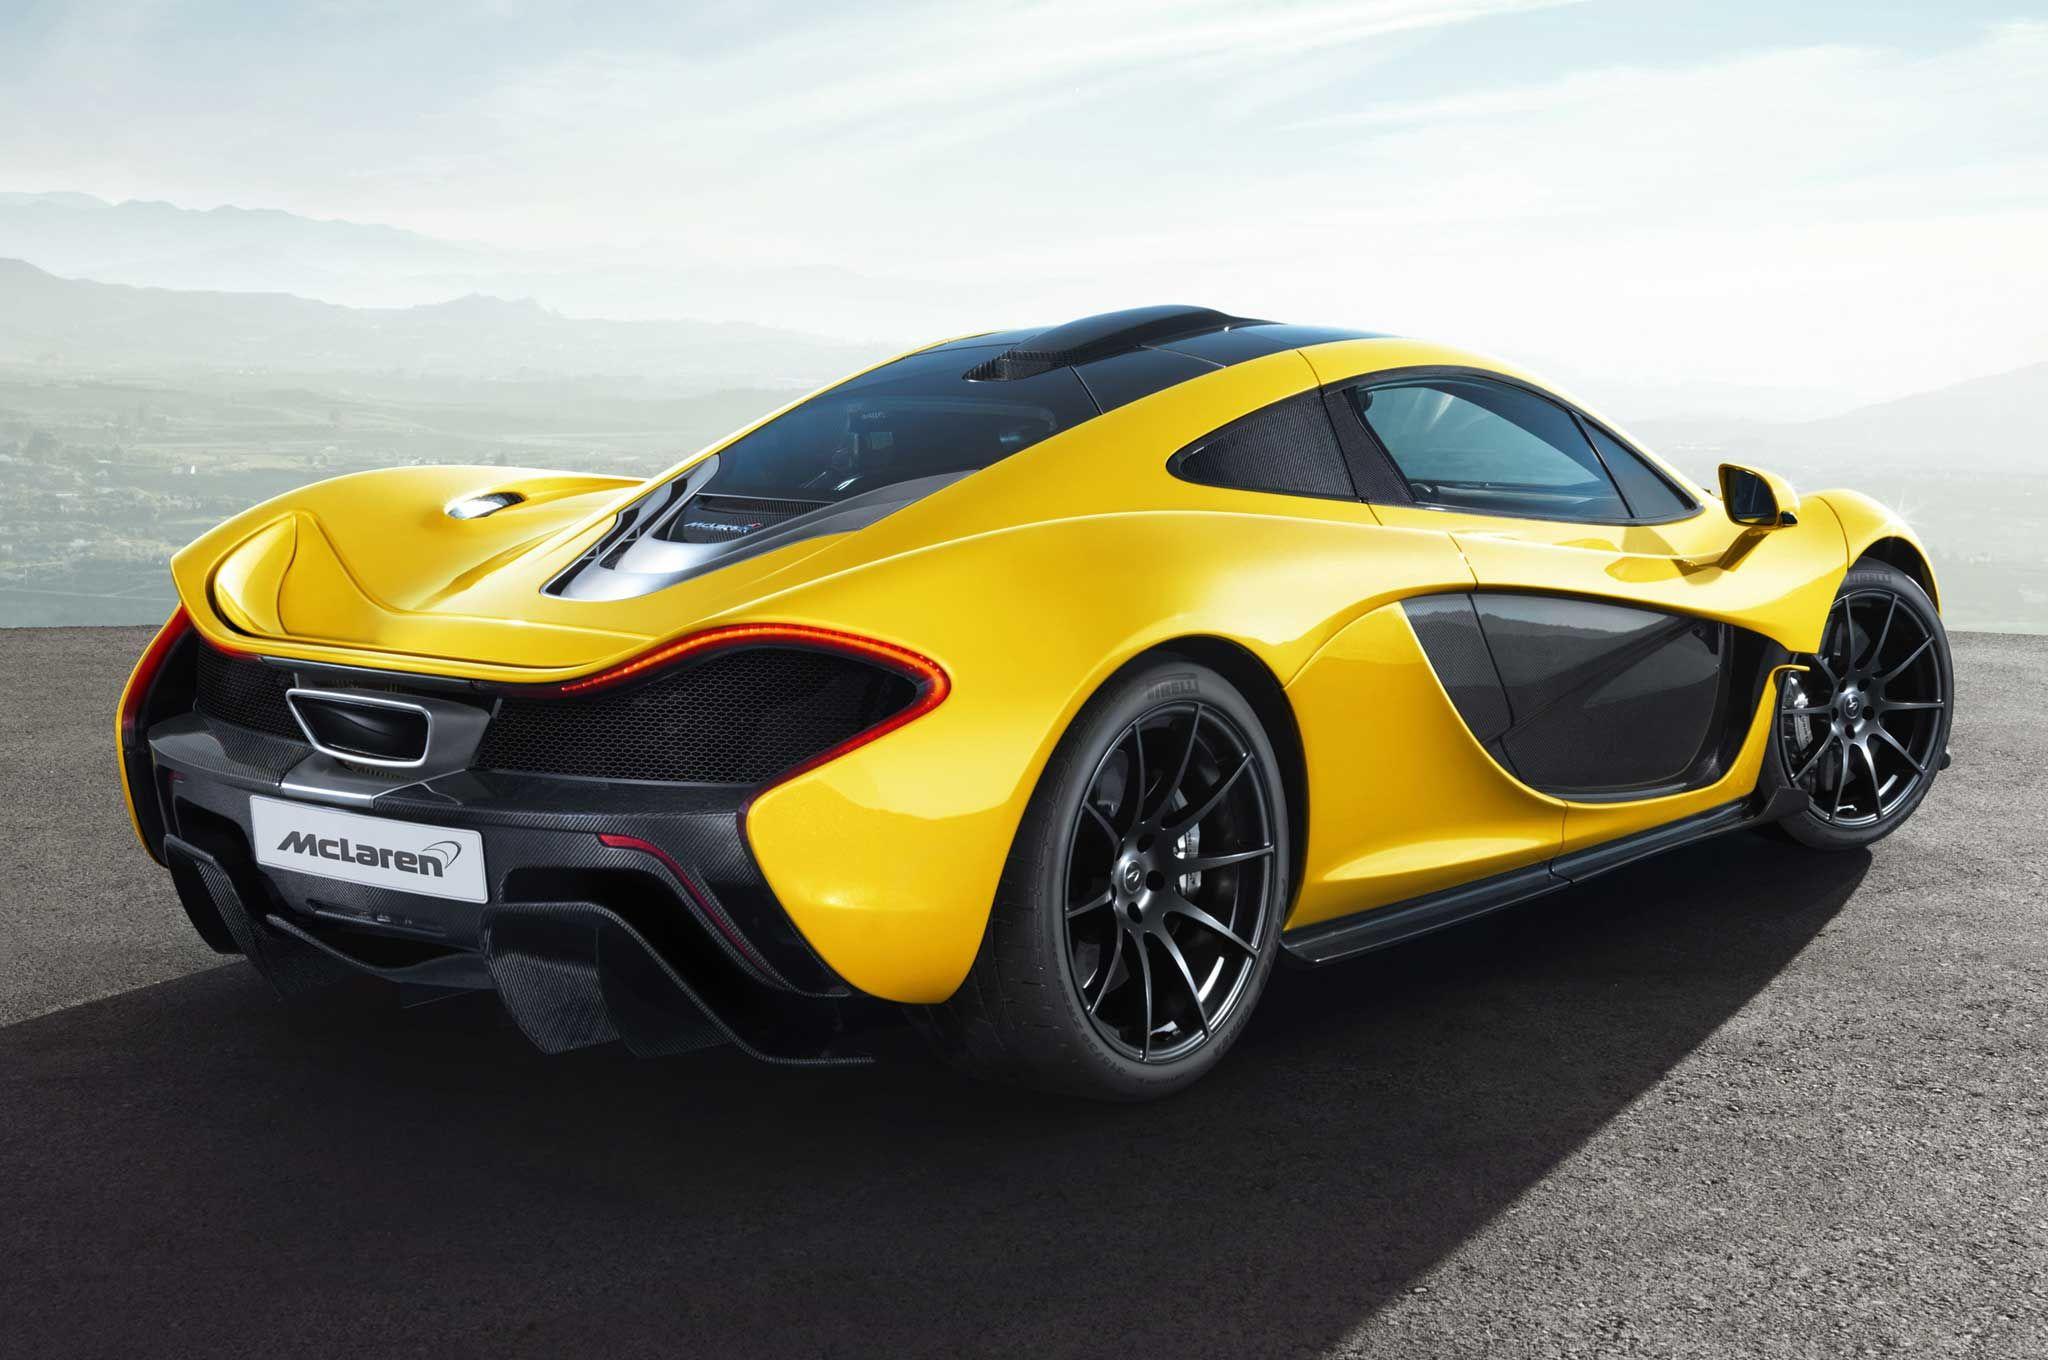 2015 McLaren P1 Cool Car Wallpaper - http://carwallspaper ...